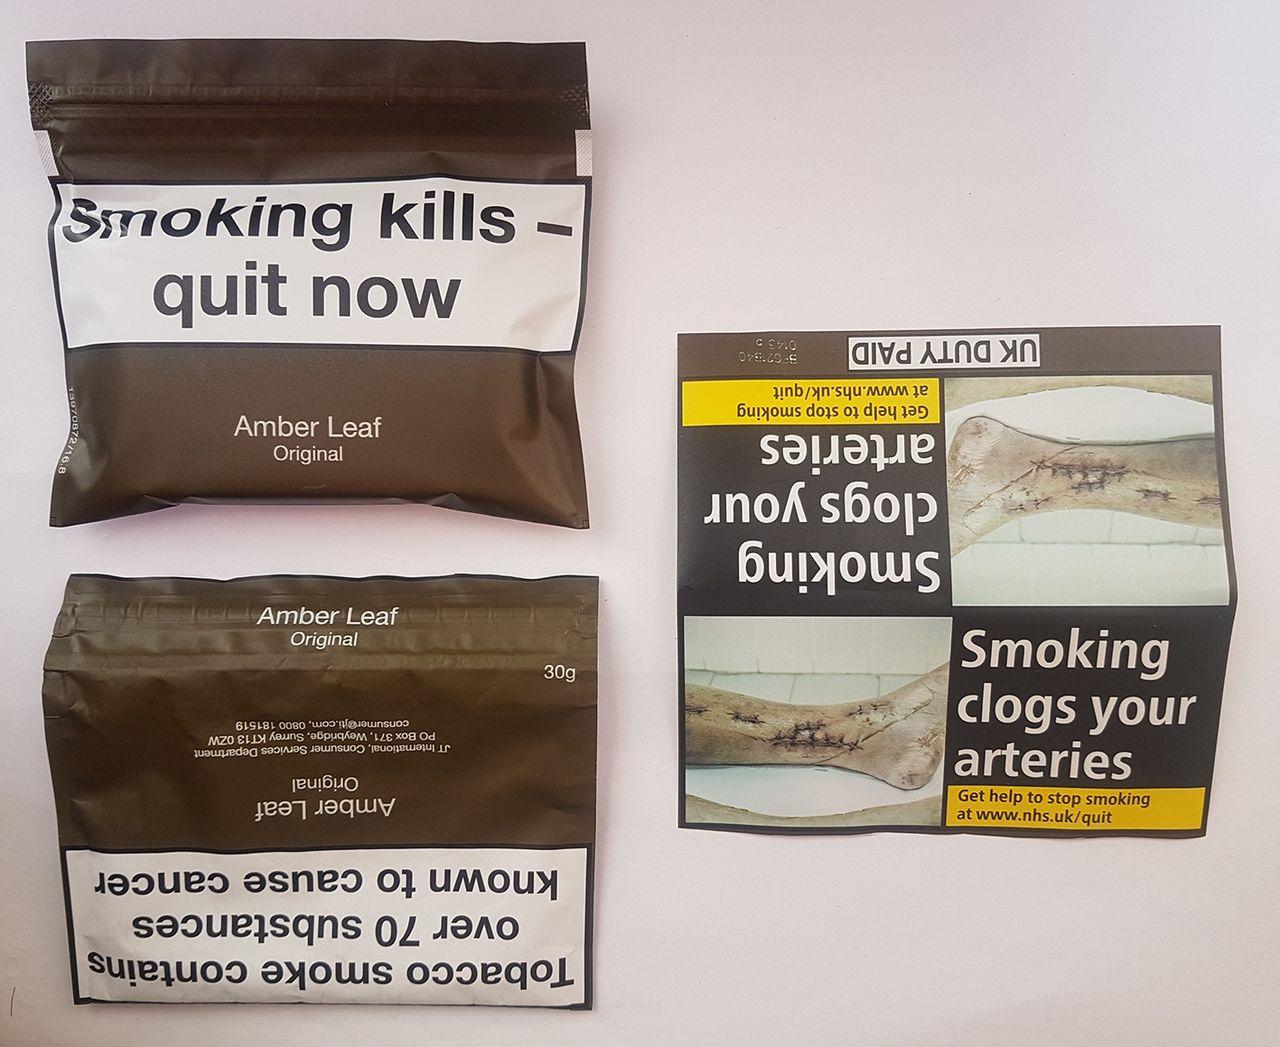 Kool cigarettes cost per pack